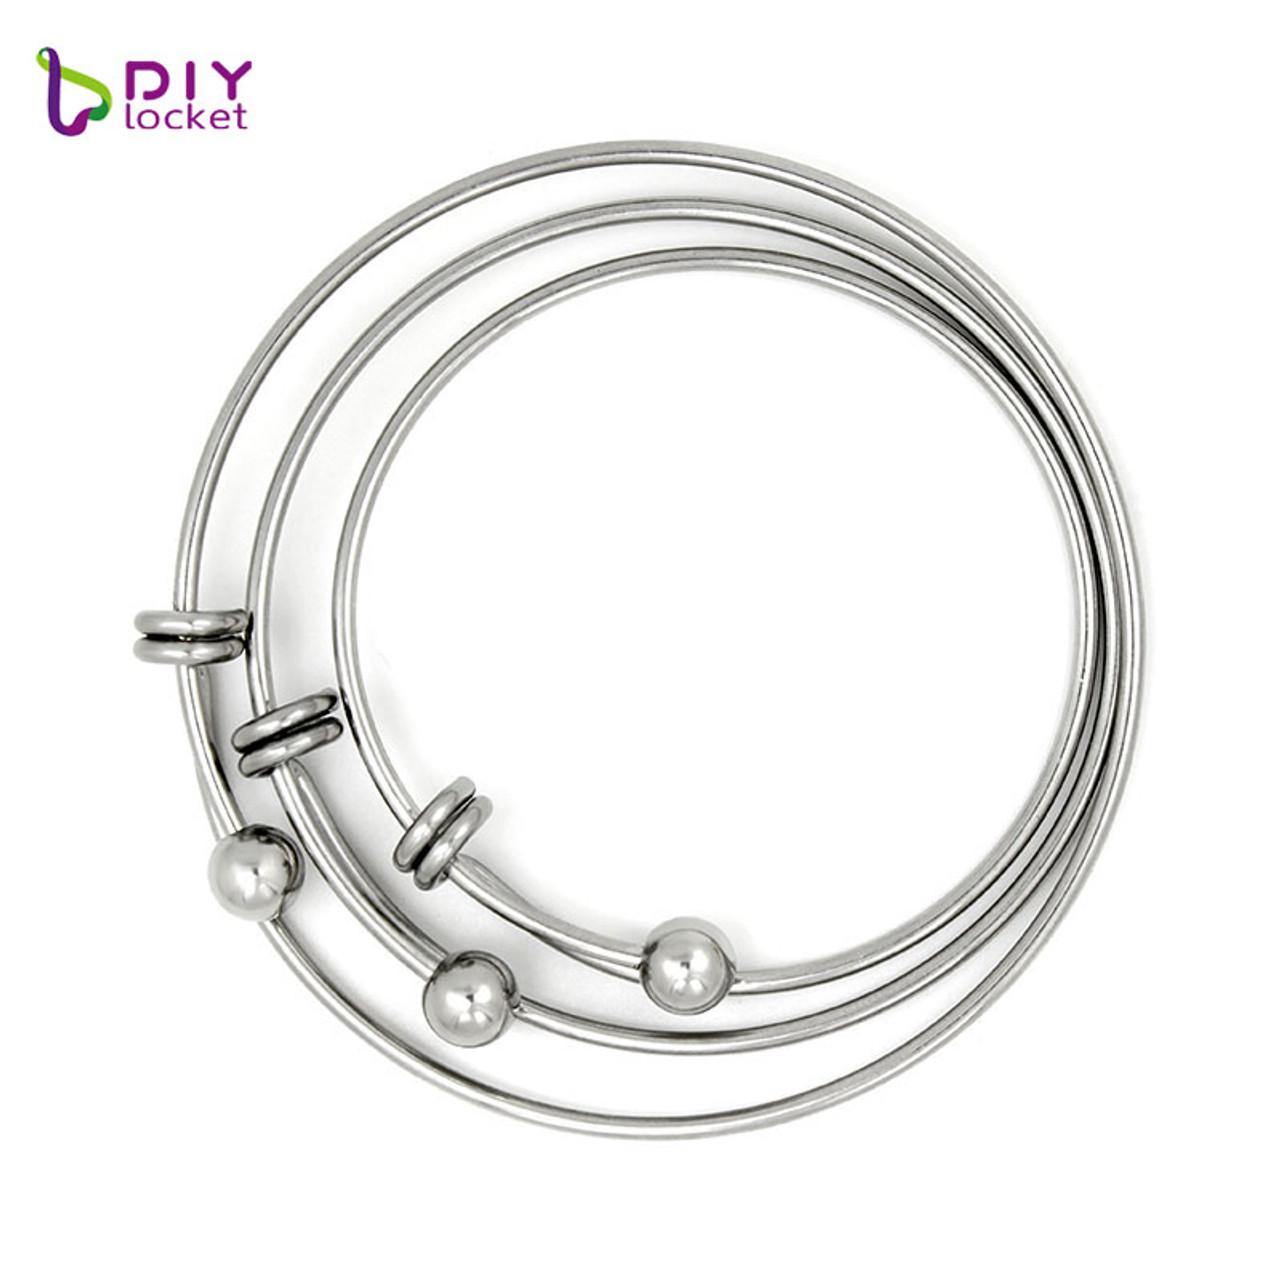 Unique Name Custom Bangle Bracelet Charm Bracelet Silver Alloy Fashion Jewelry